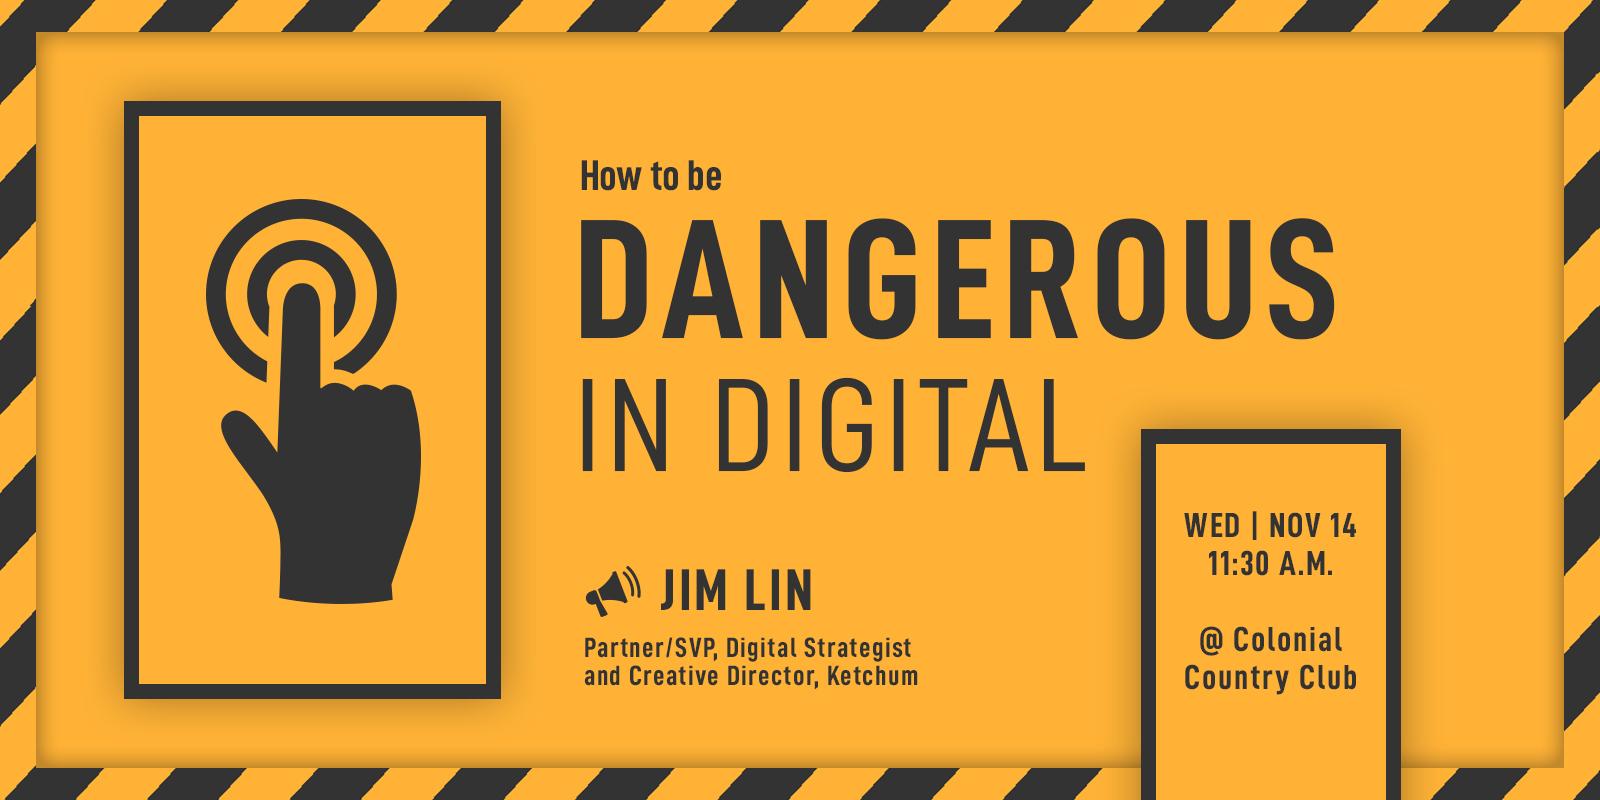 How to be Dangerous in Digital